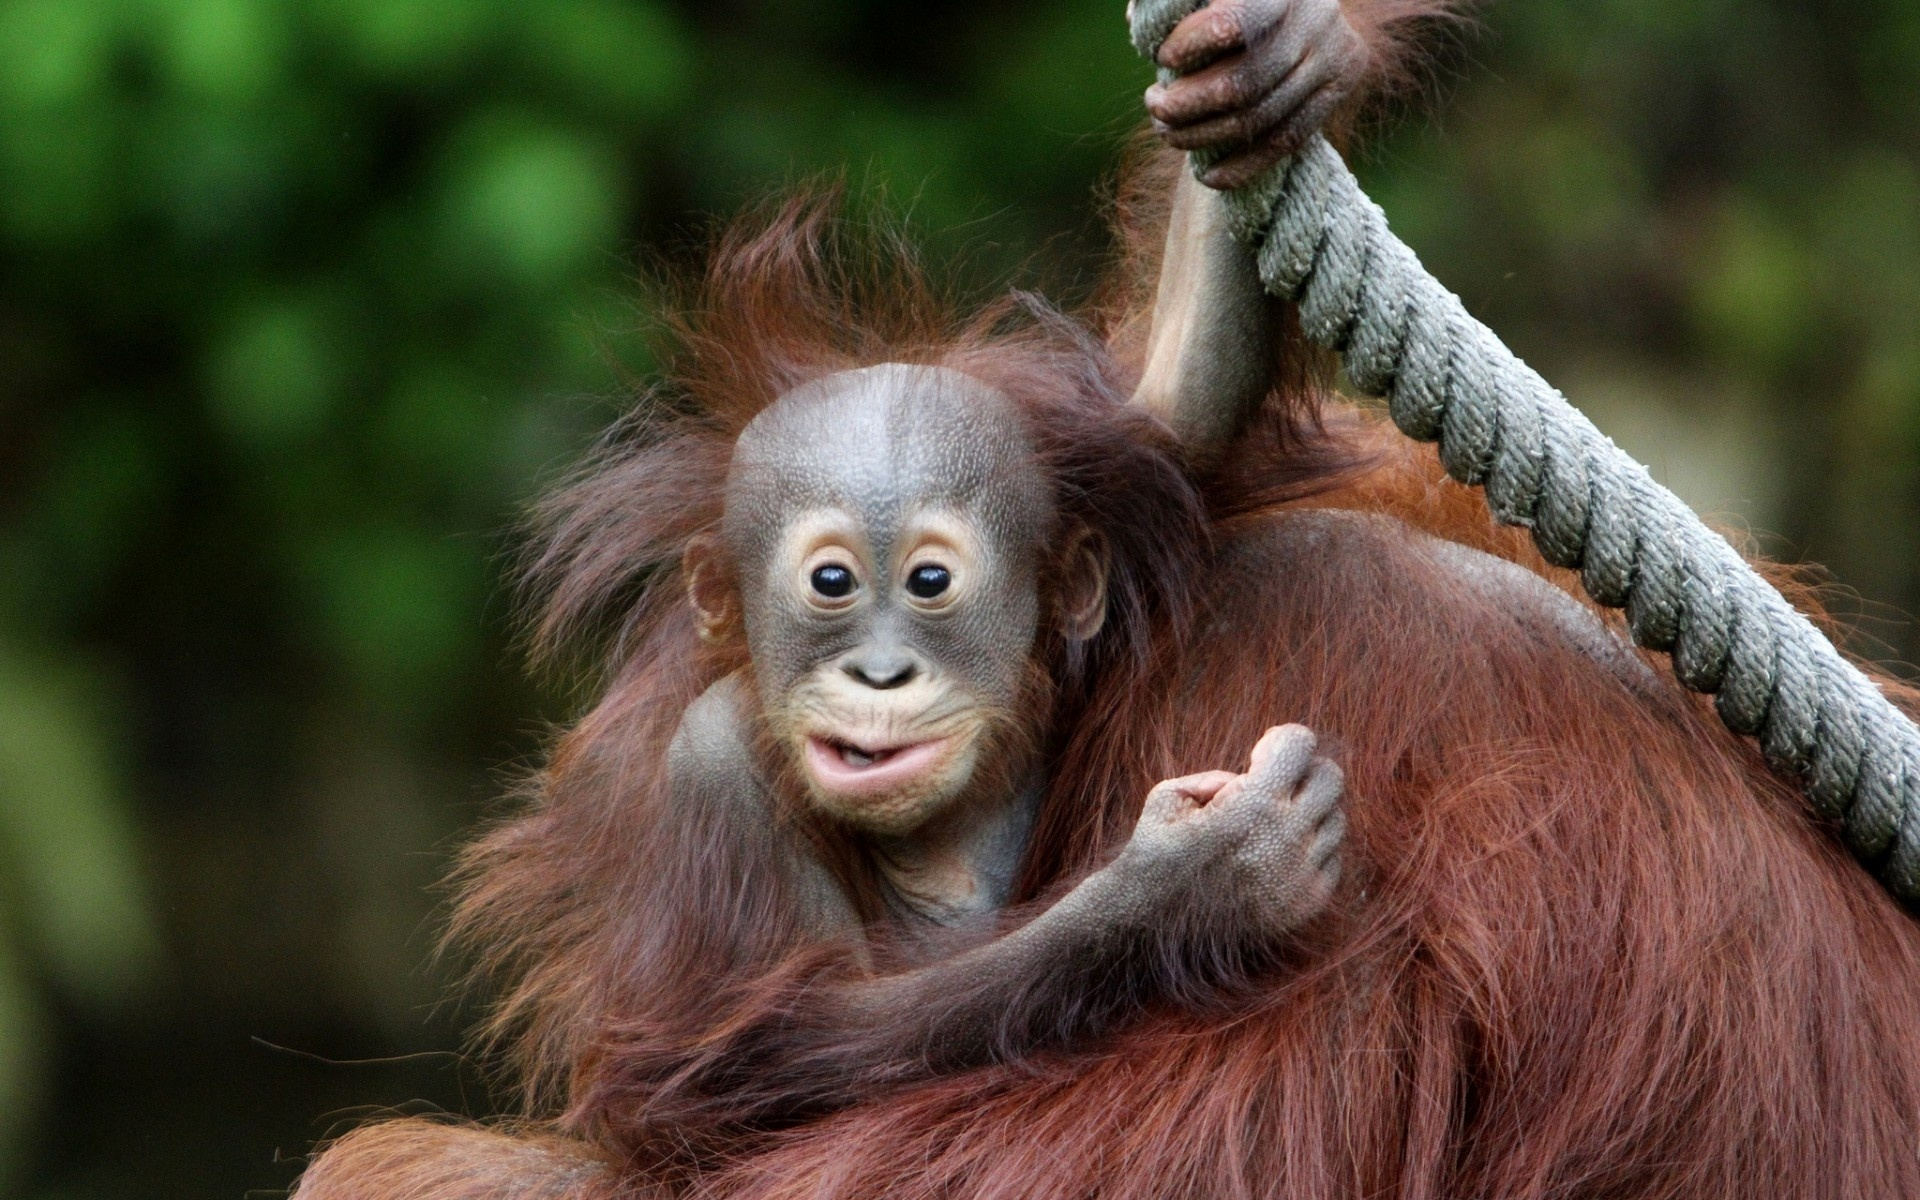 Orangutan Hd Wallpaper Background Image 1920x1200 Id341139